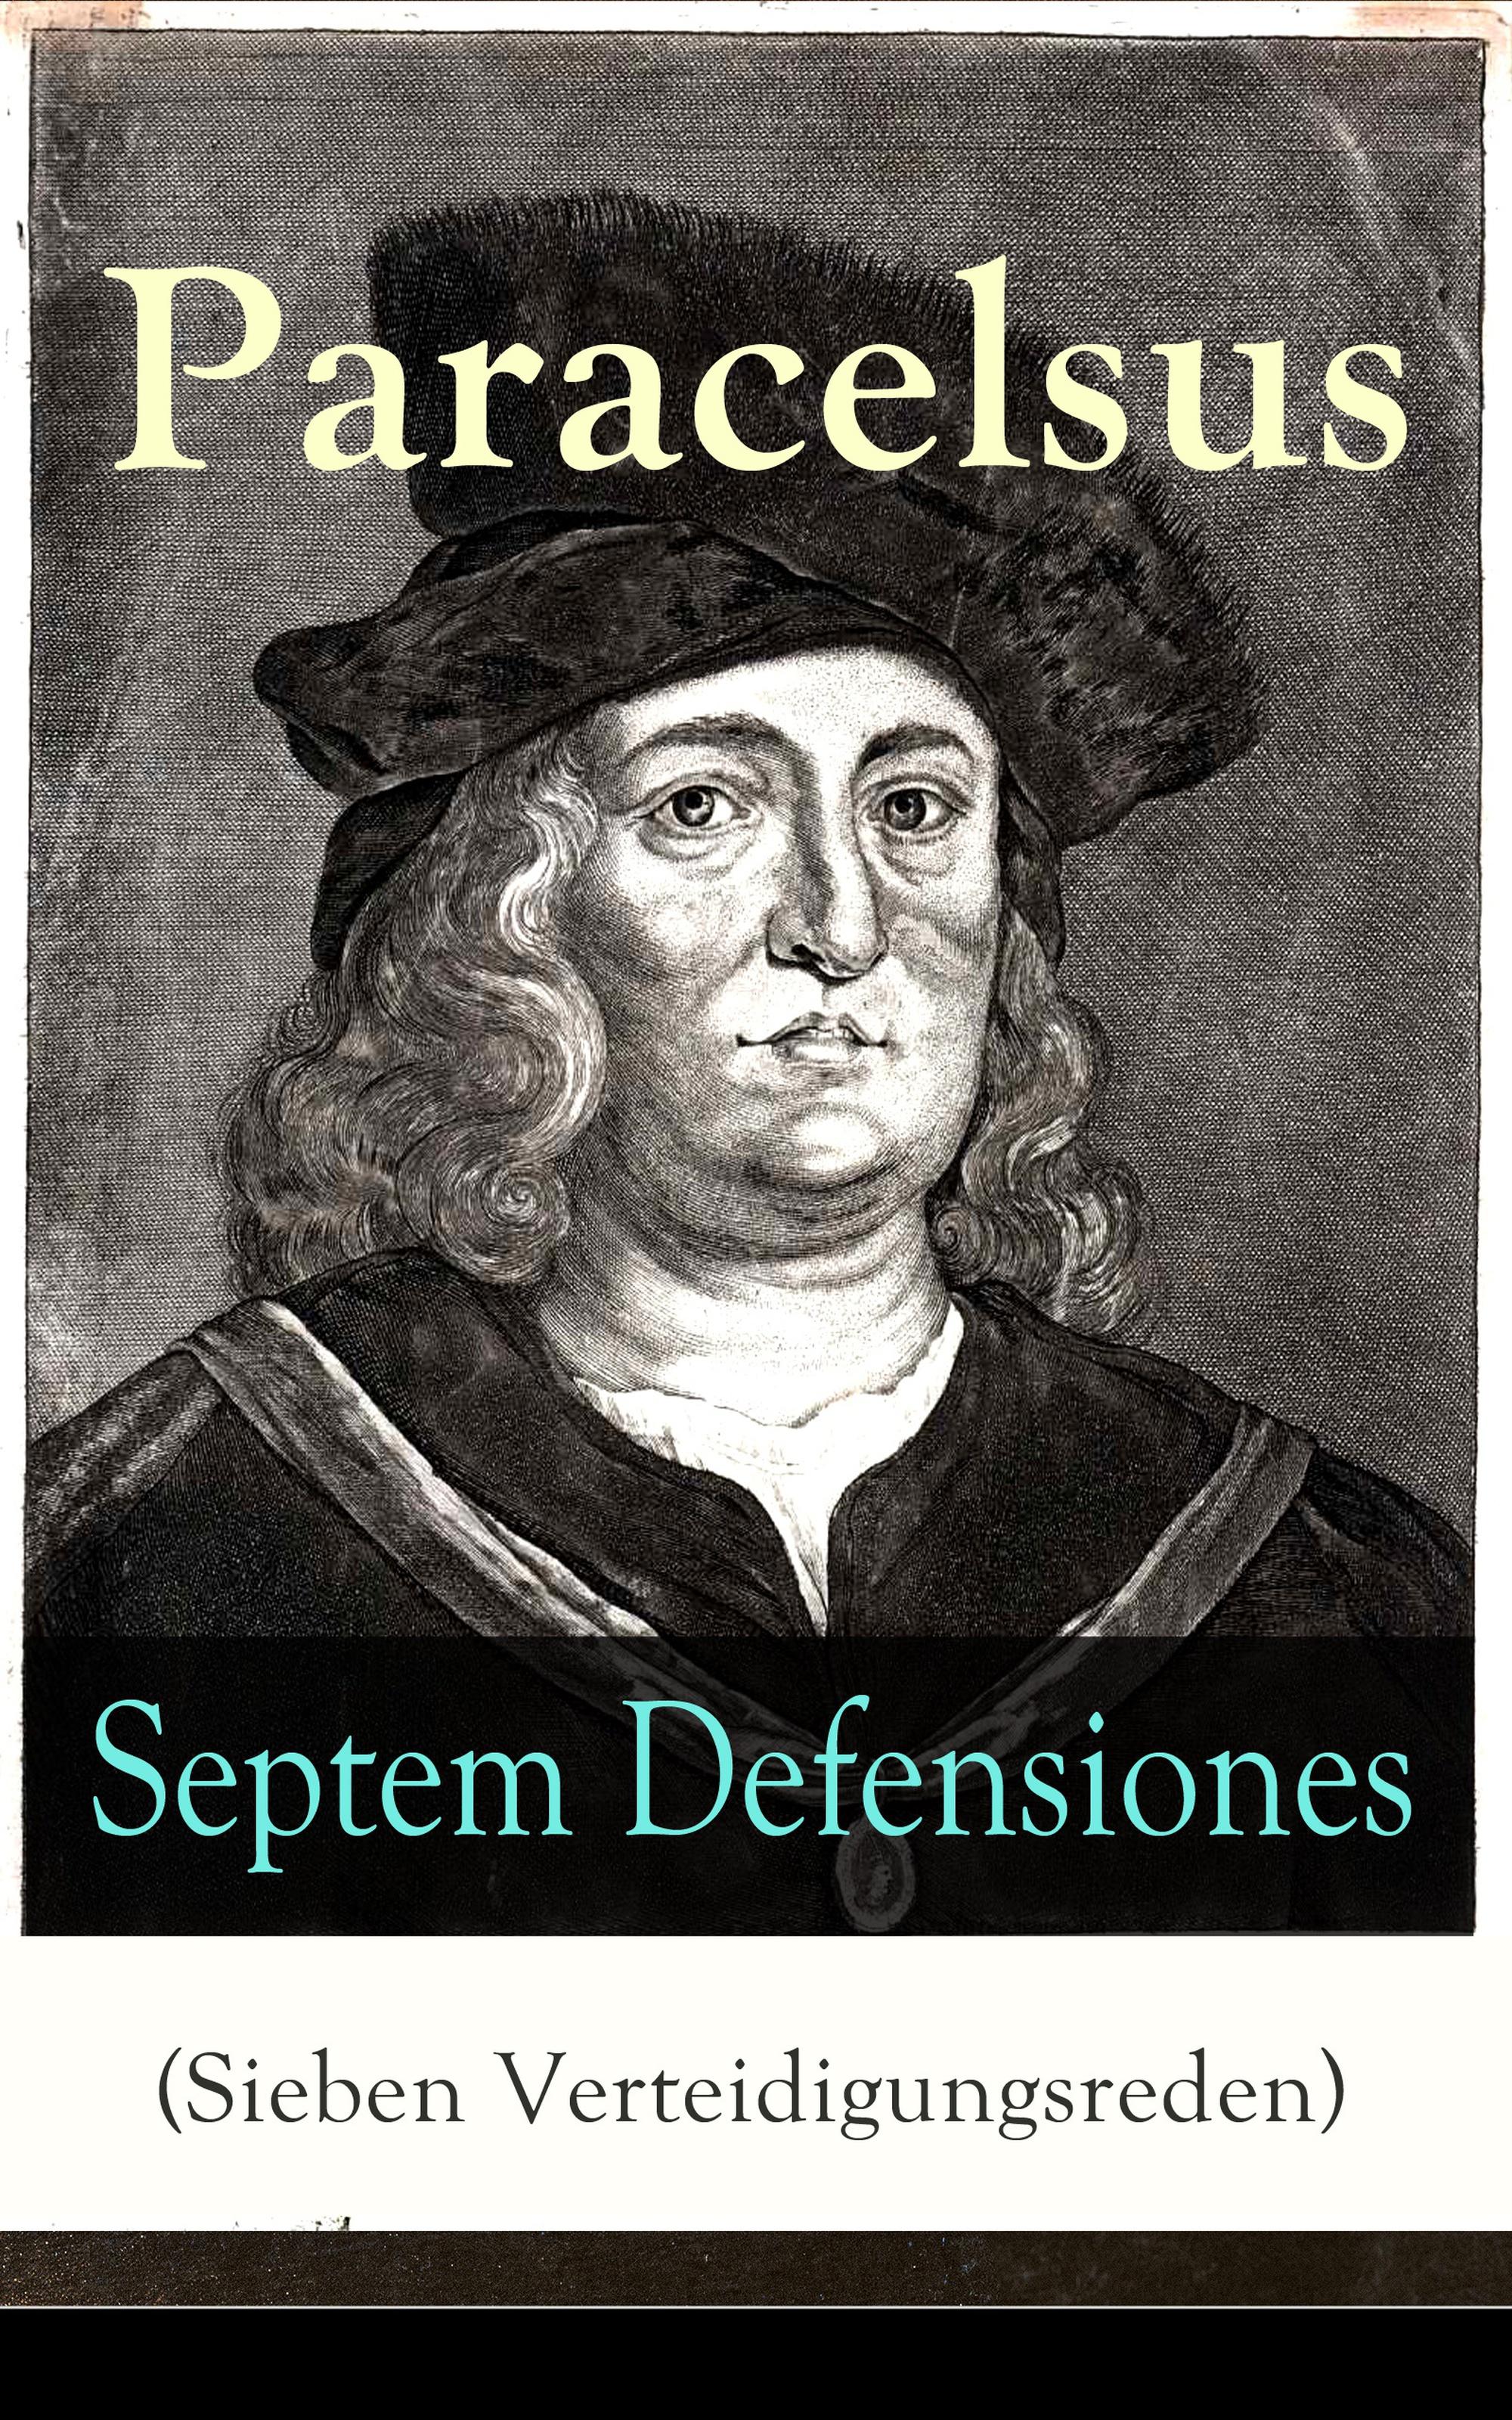 Paracelsus Septem Defensiones (Sieben Verteidigungsreden)